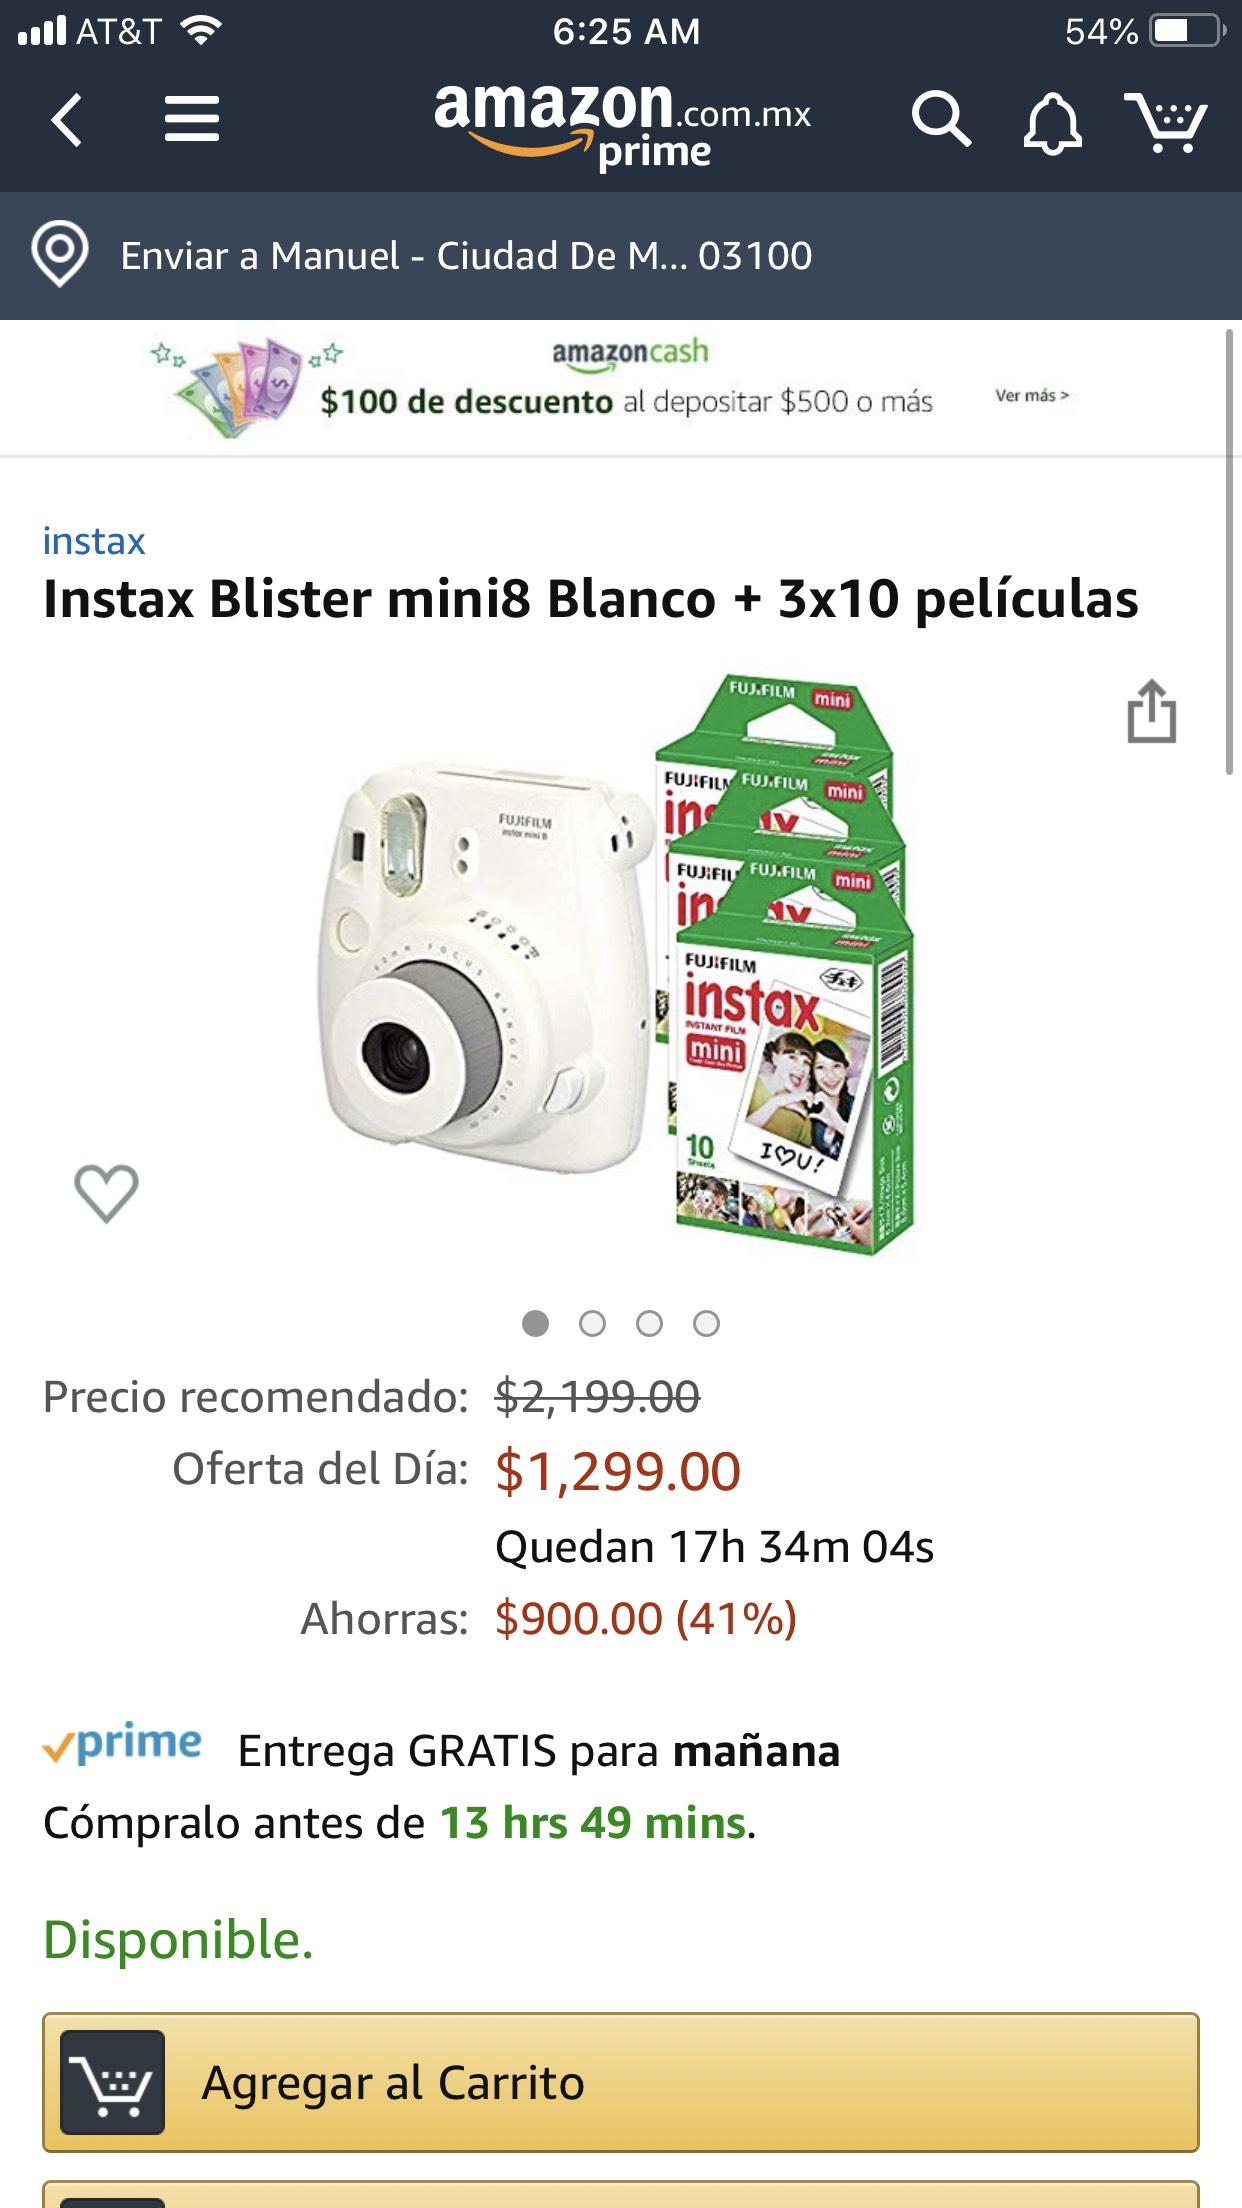 Amazon: Instax Blister mini8 Blanco + 3x10 películas